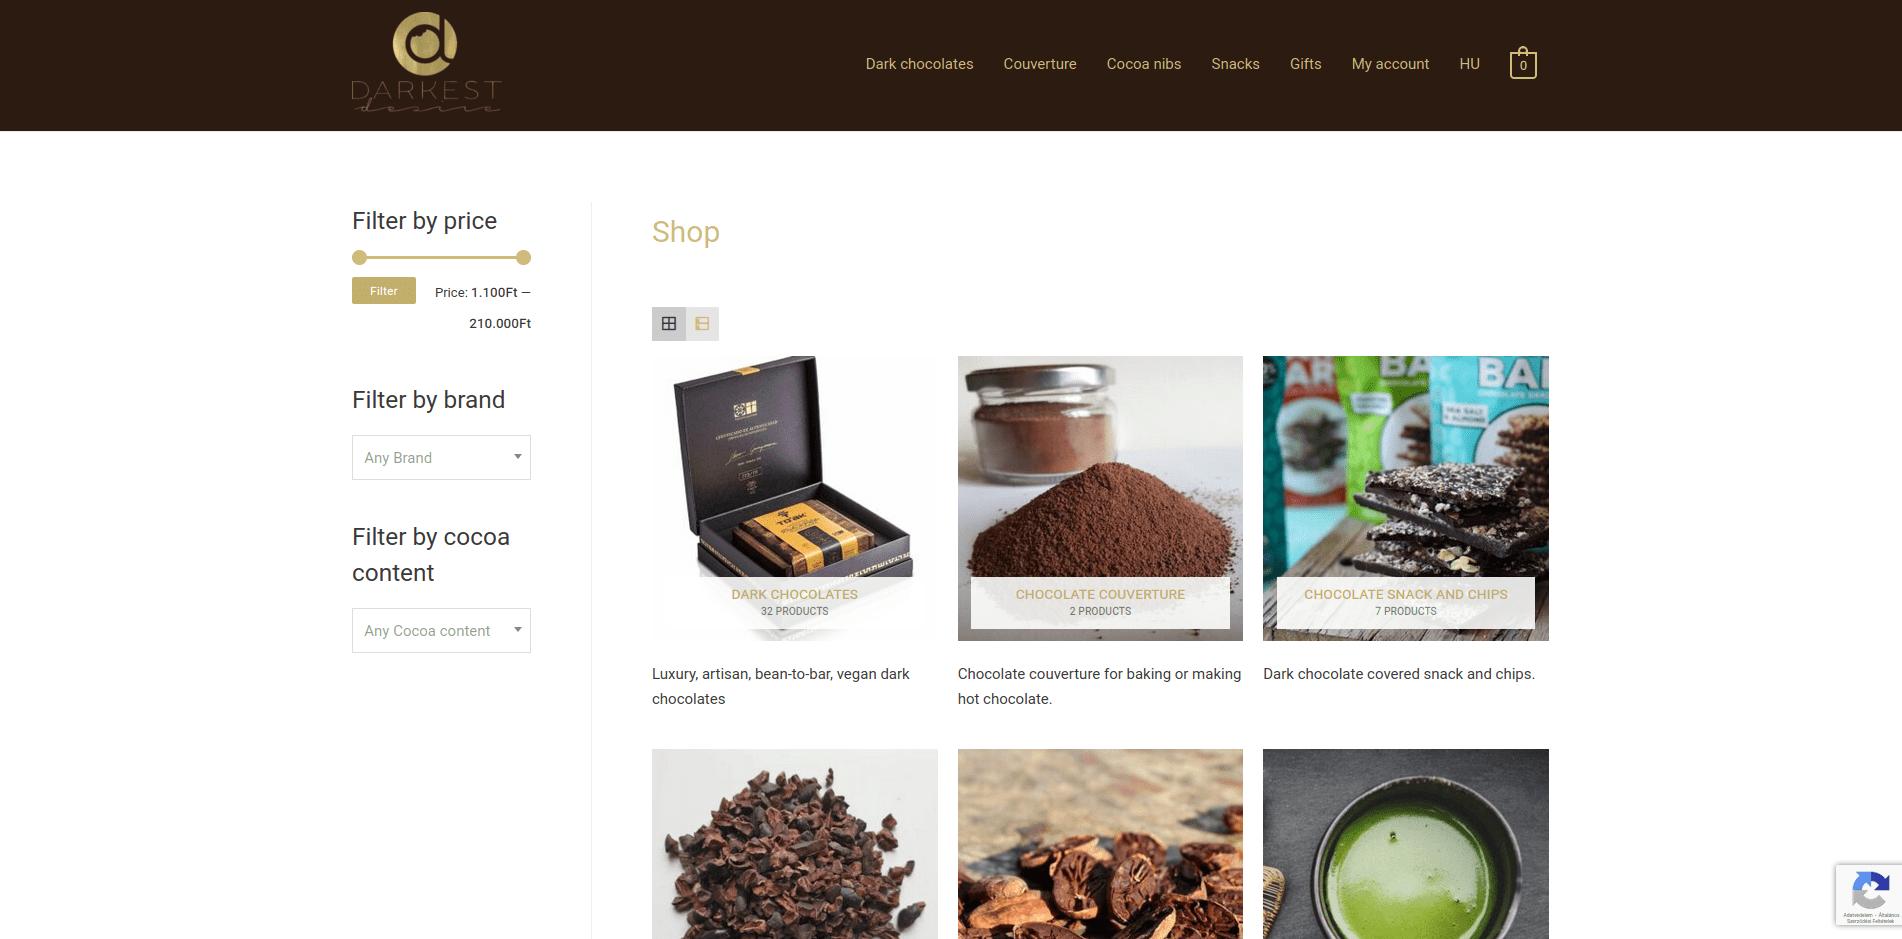 darkchocolates.eu webshop